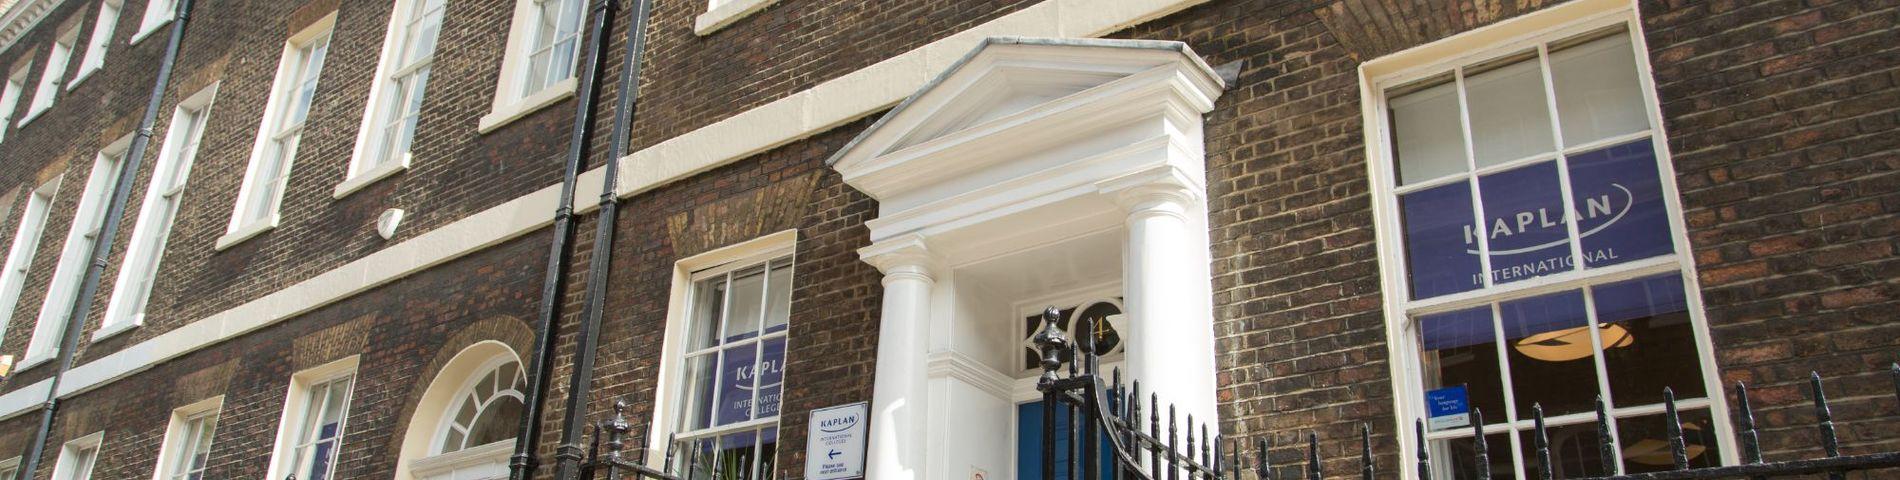 Kaplan International Languages - Covent Garden bild 1